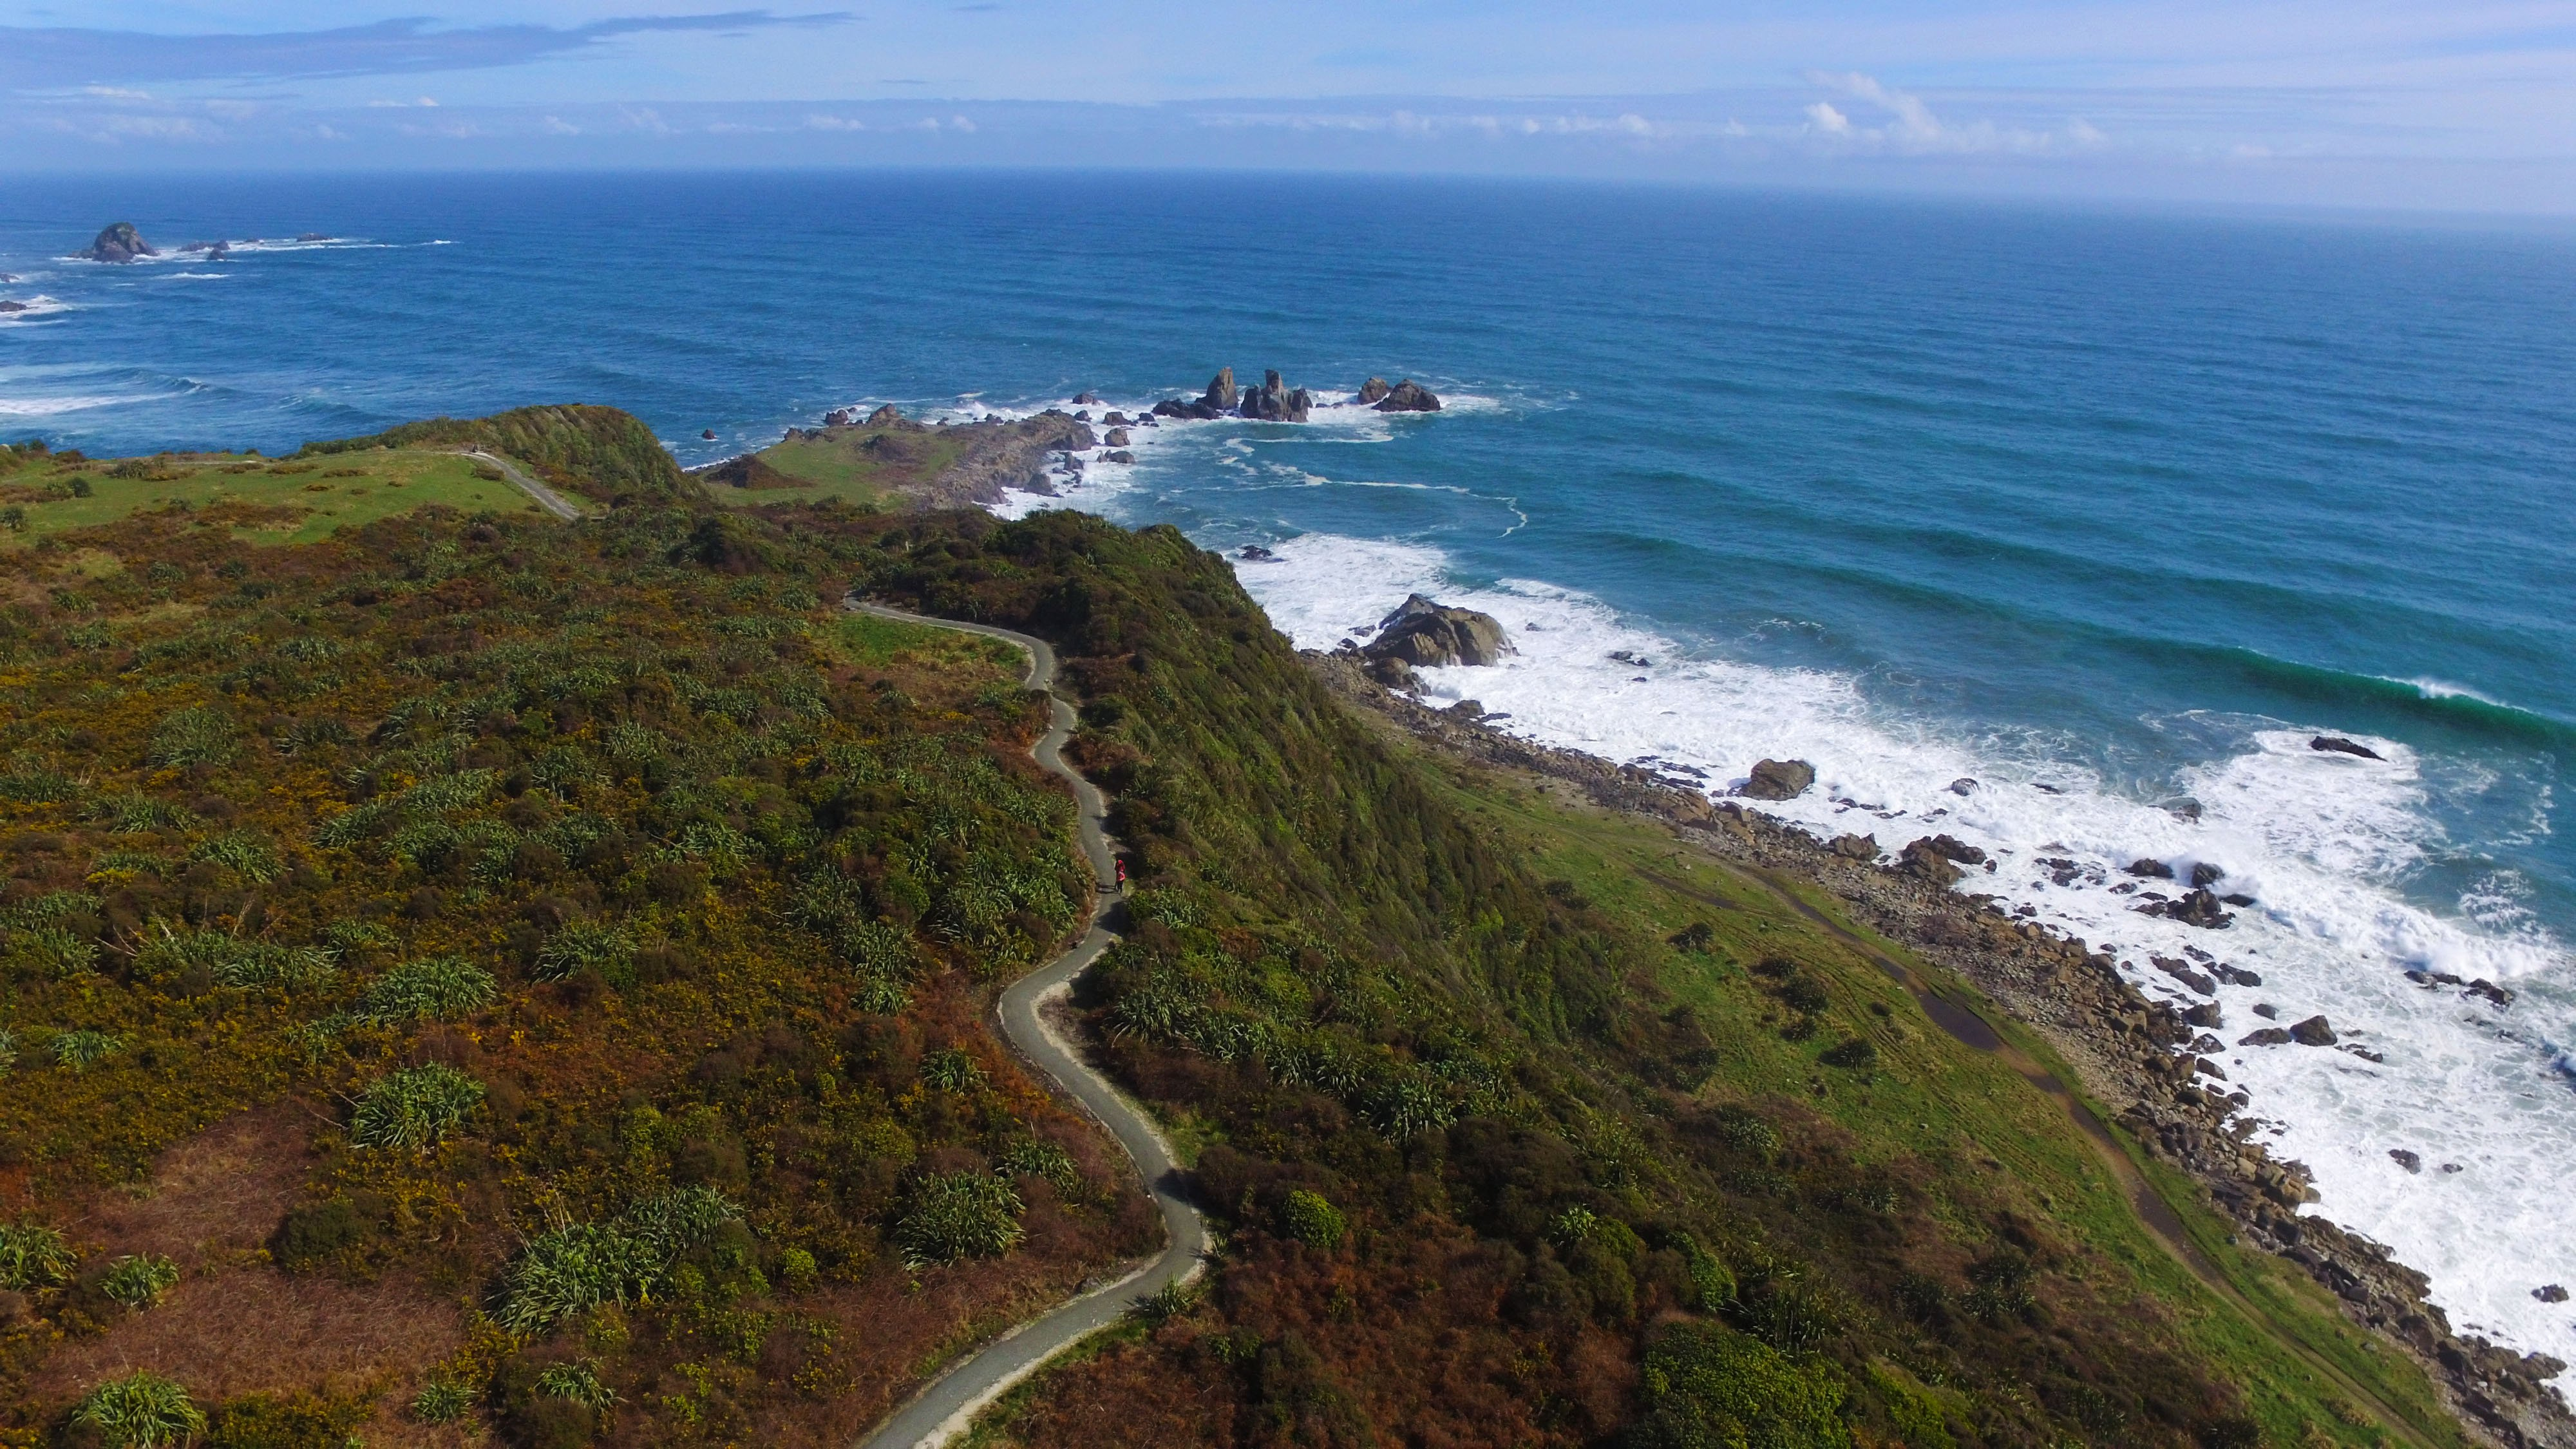 Cape_Foulwind_Walkway_West_Coast.original